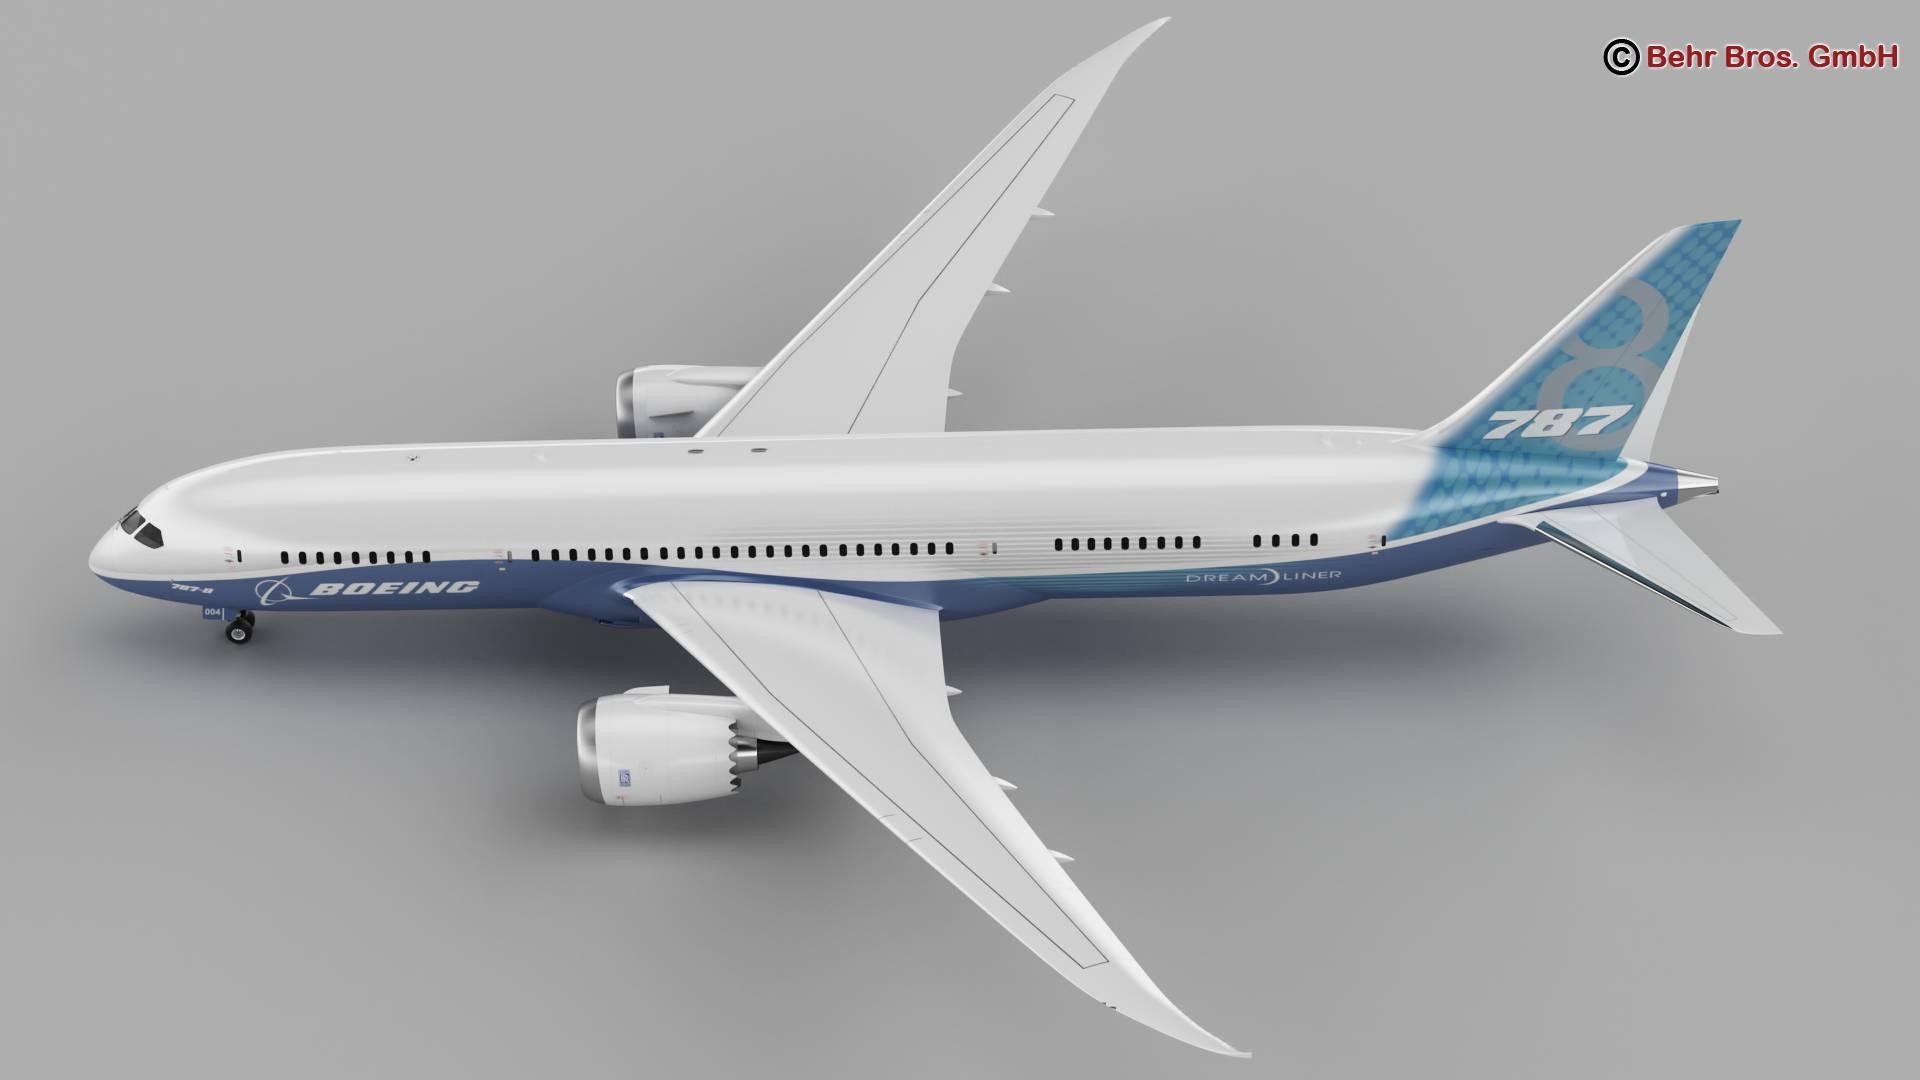 Boeing 787-8 3d gerð 3ds max fbx c4d lwo ma mb obj 251355